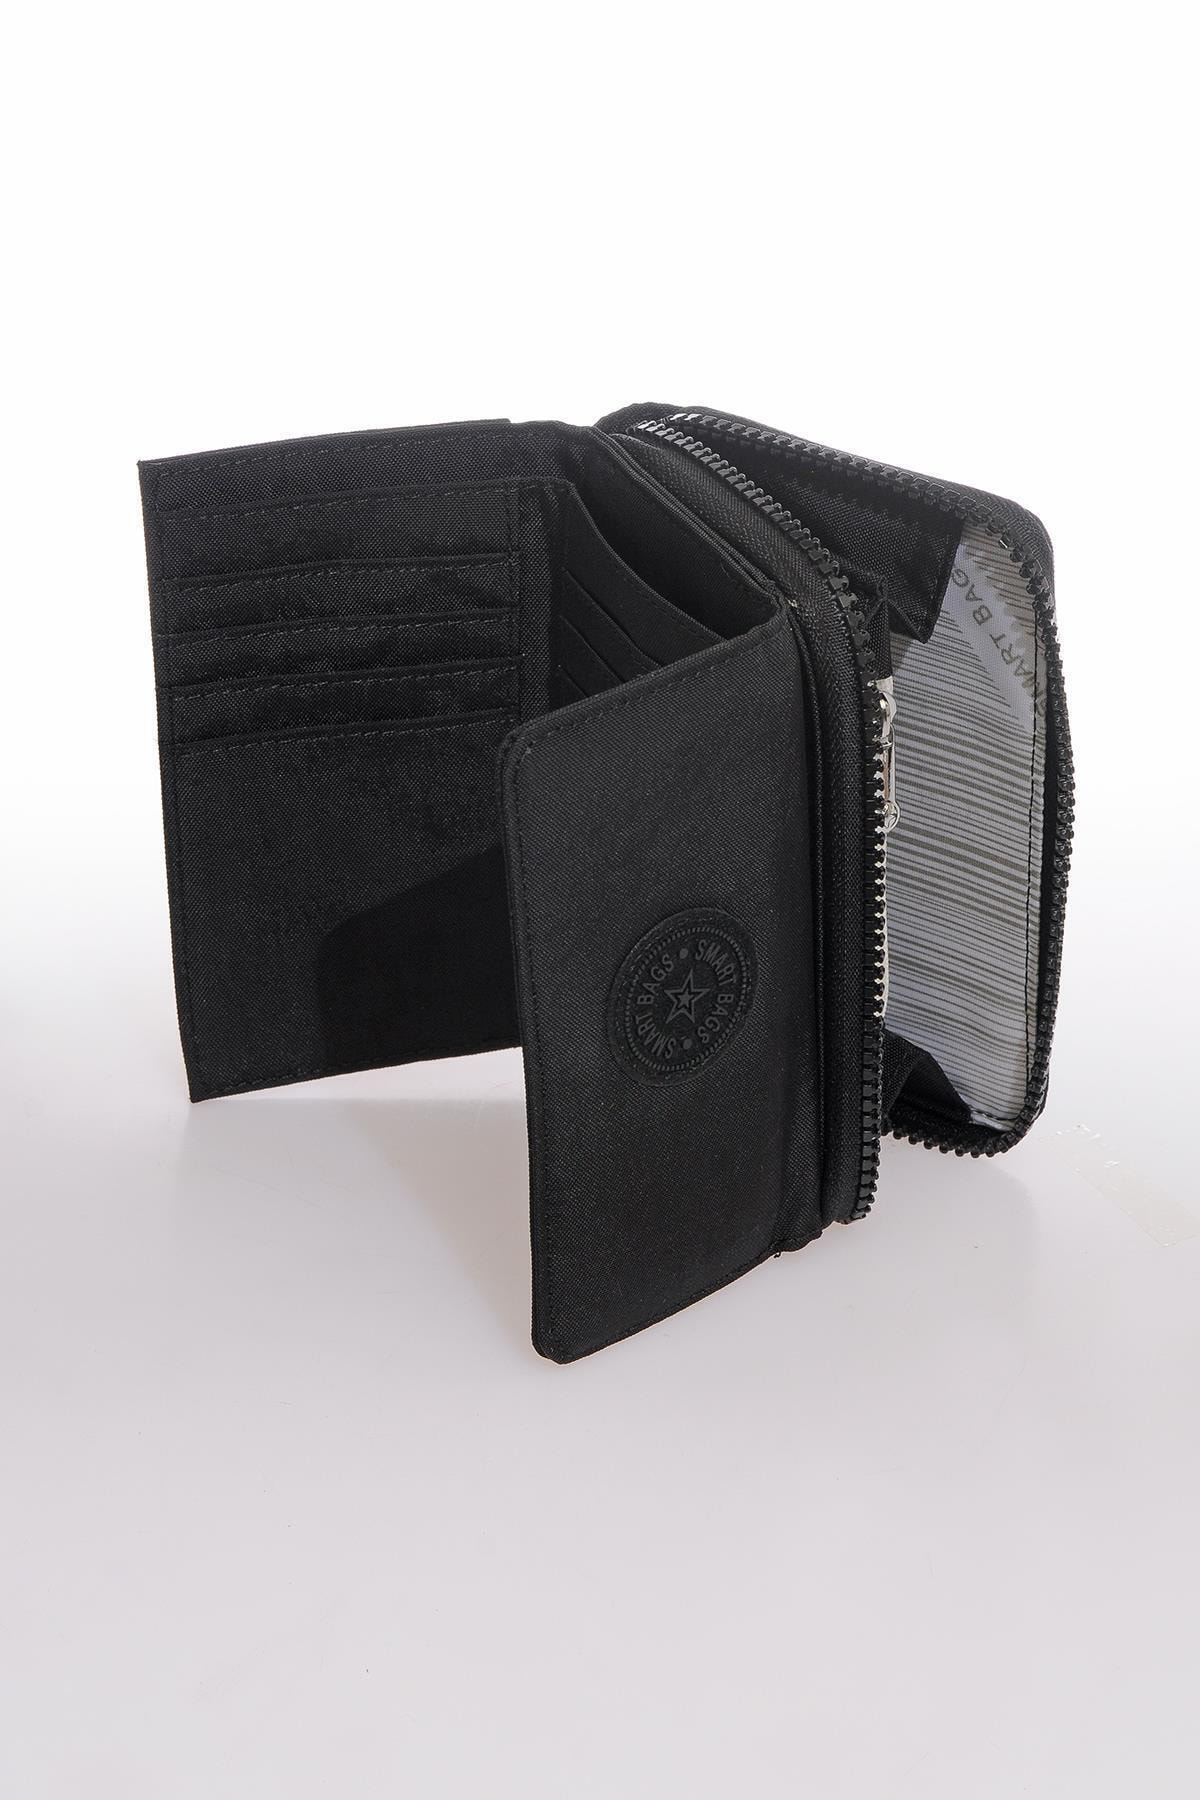 Smart Bags Smb3036-0001 Siyah Kadın Cüzdan